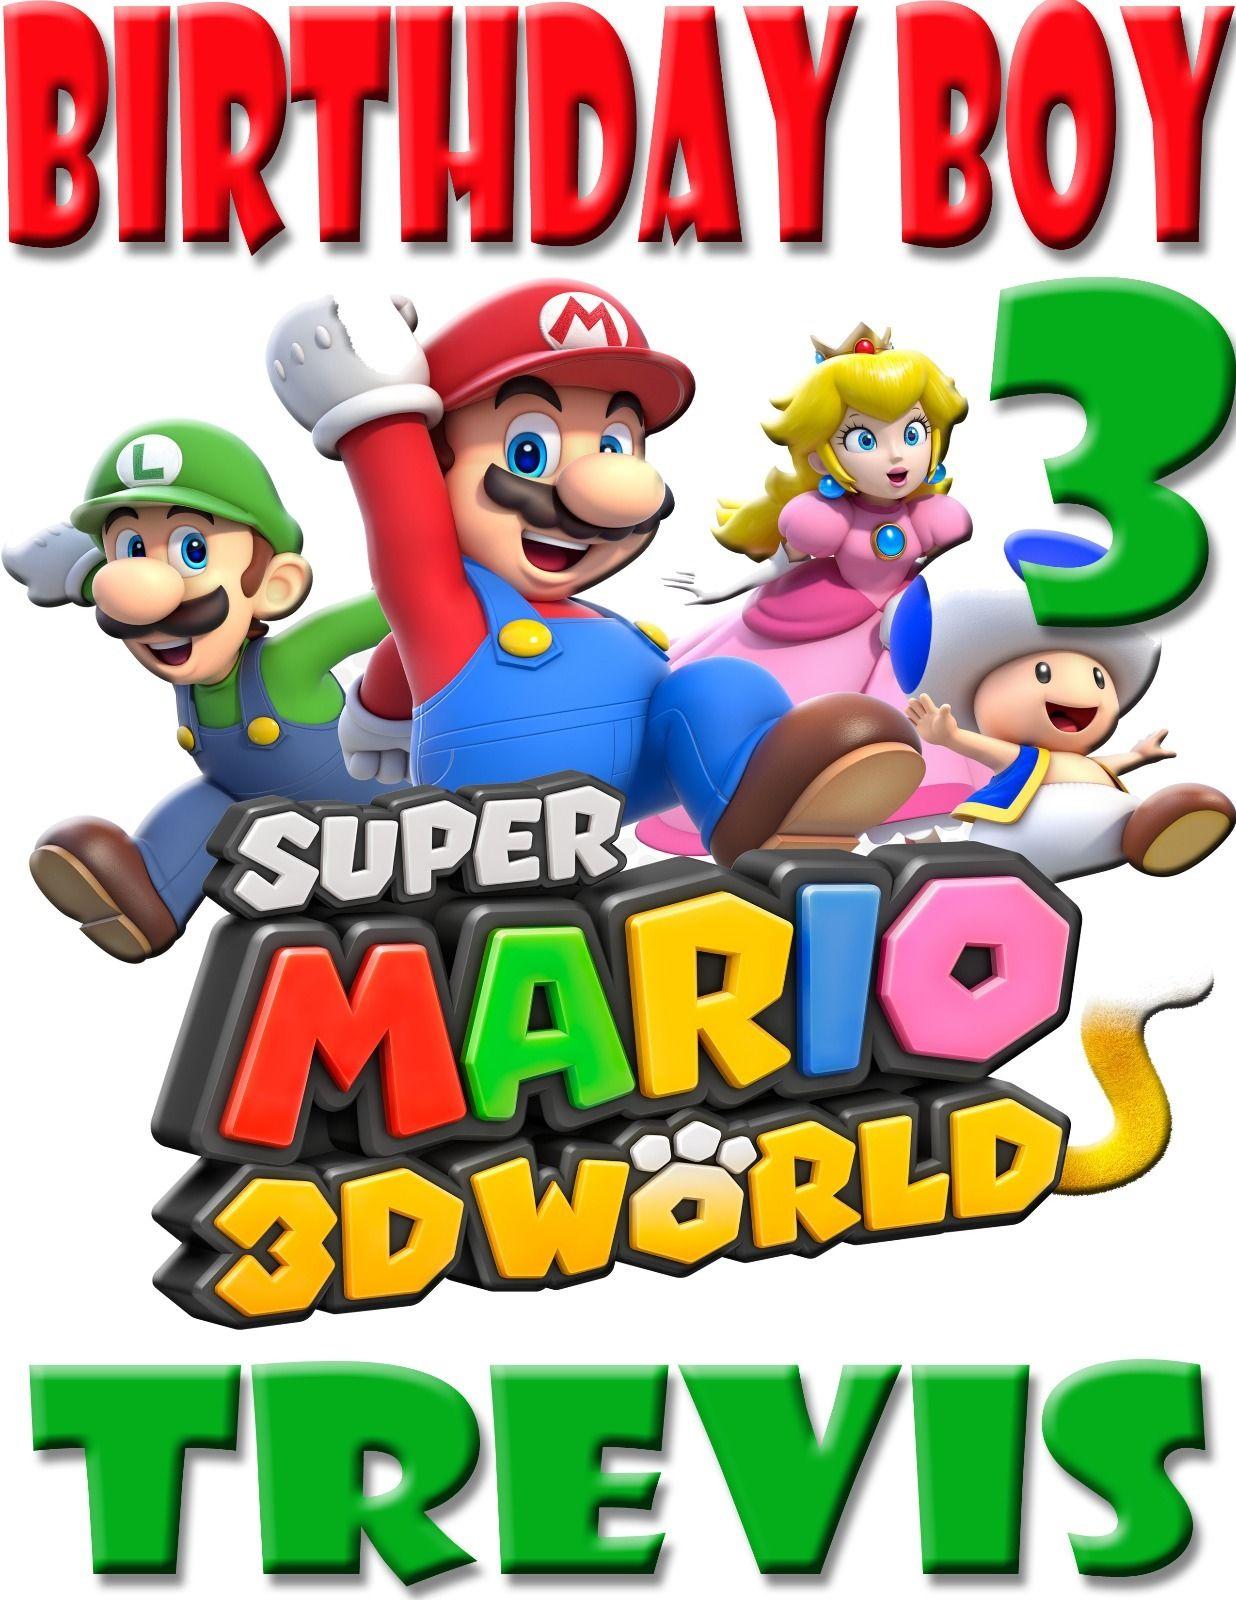 New super mario 3d custom birthday boy shirt add name